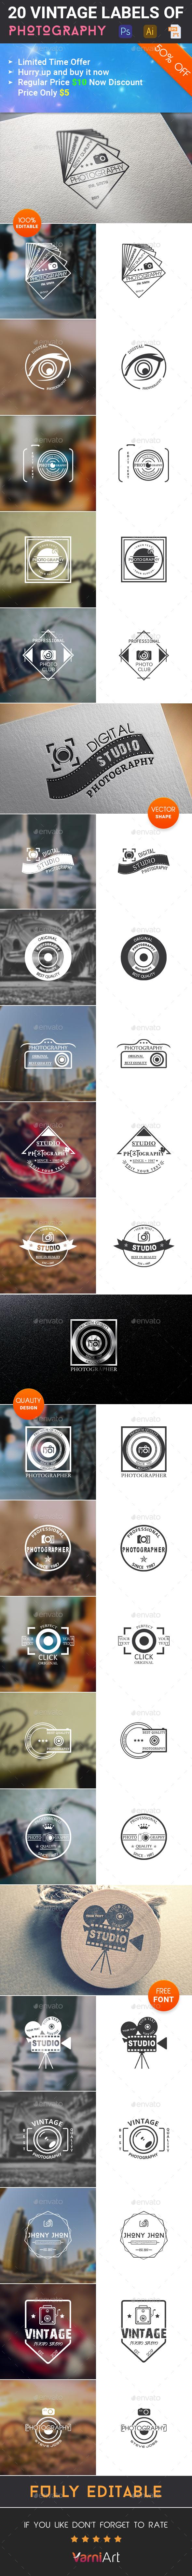 20 Photography Vintage Labels - Badges & Stickers Web Elements